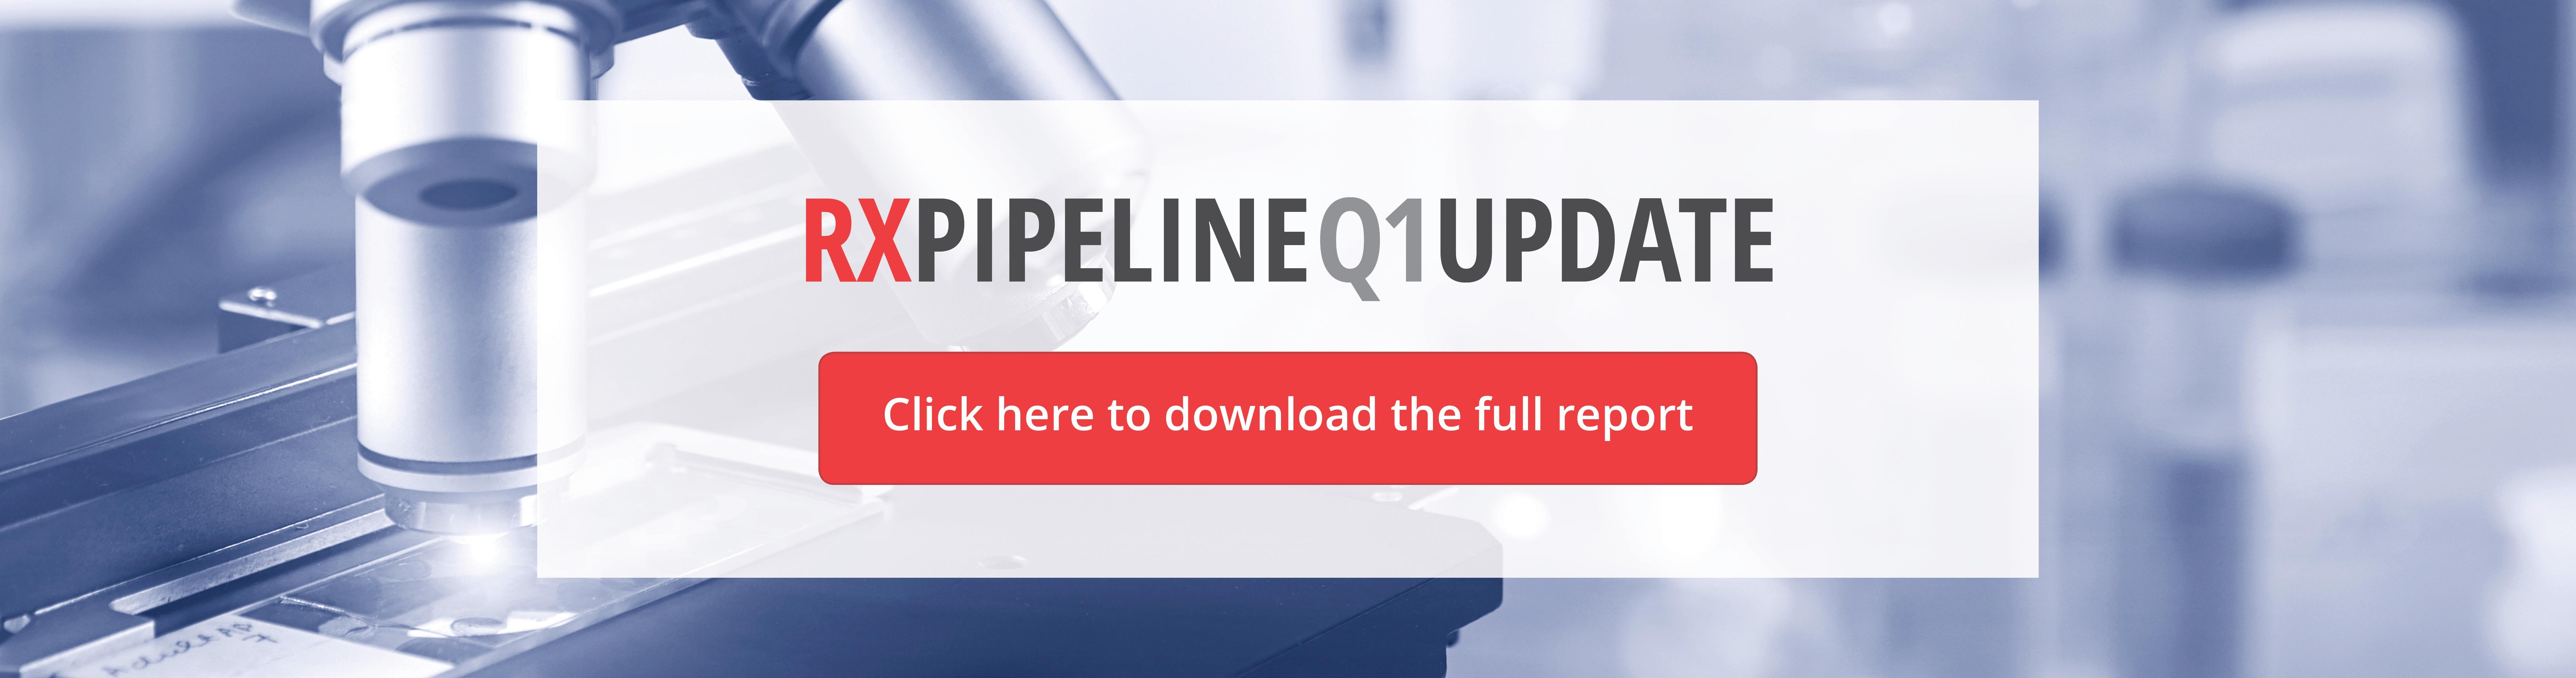 Pipeline Updates Blog Banner Q1 1900w.jpg